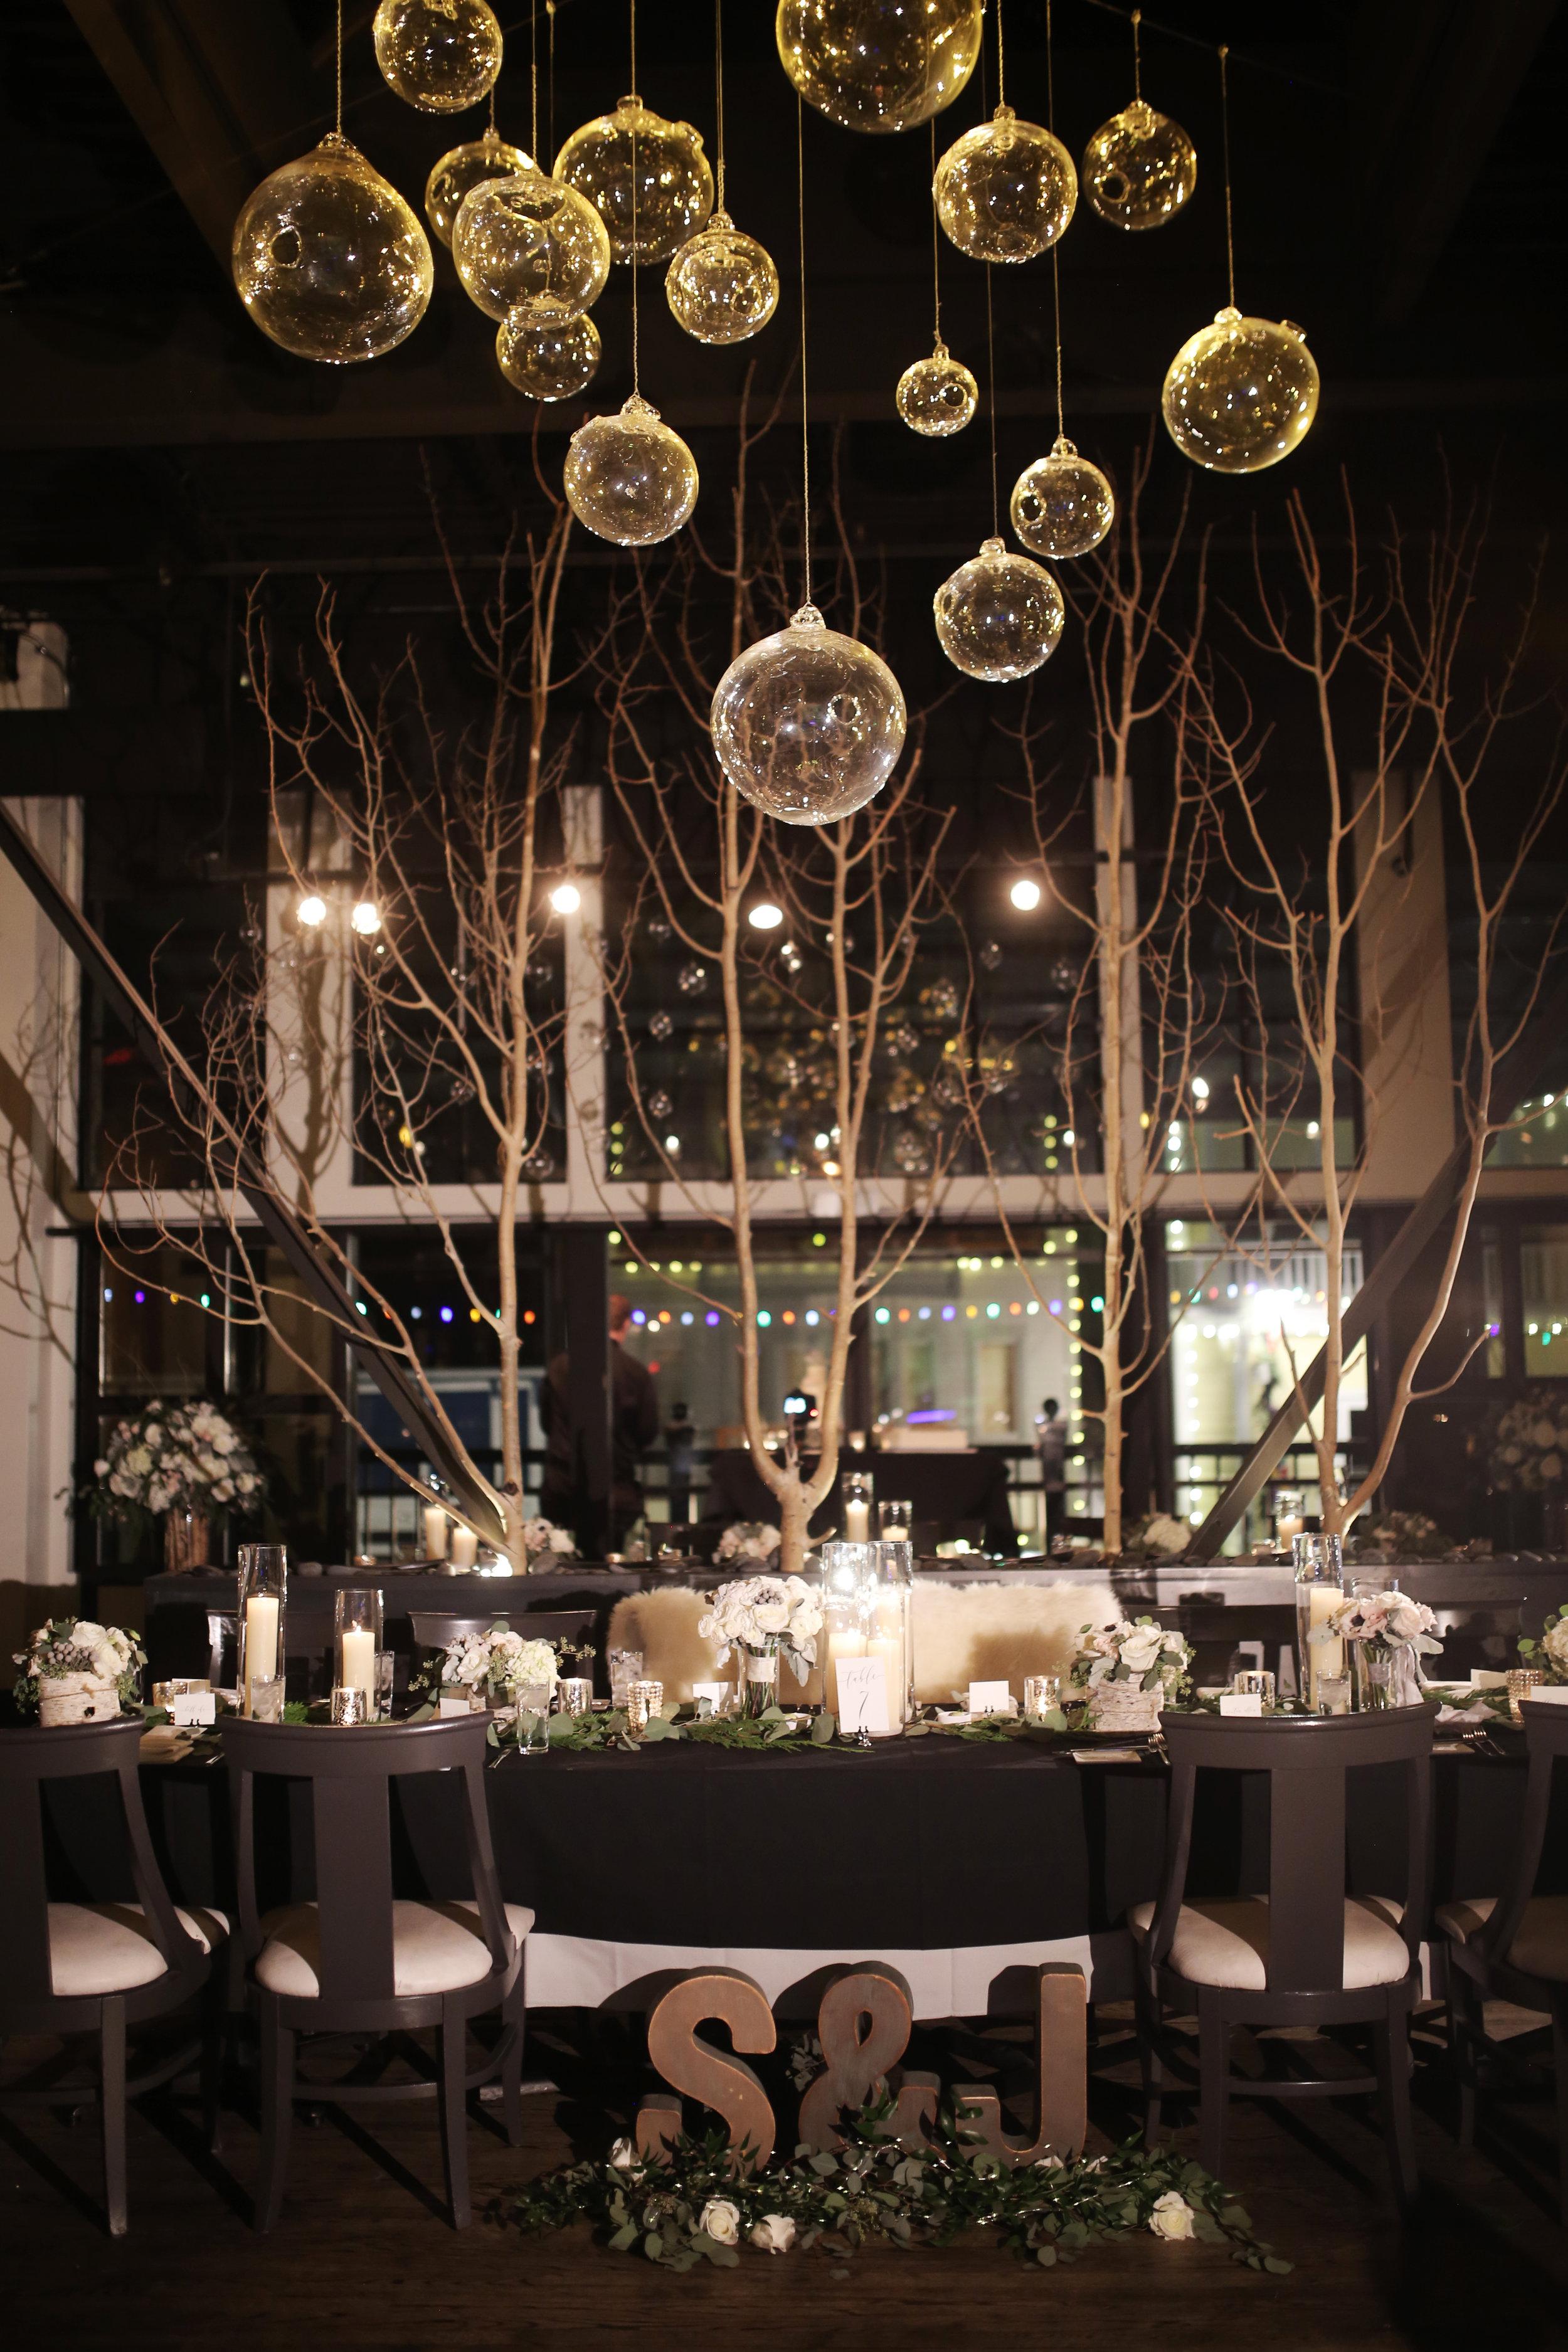 Park City Winter Wedding   Black and White Wedding   Waldorf Astoria Park City   Riverhorse on Main   Michelle Leo Events   Utah Event Planner   Pepper Nix Photography